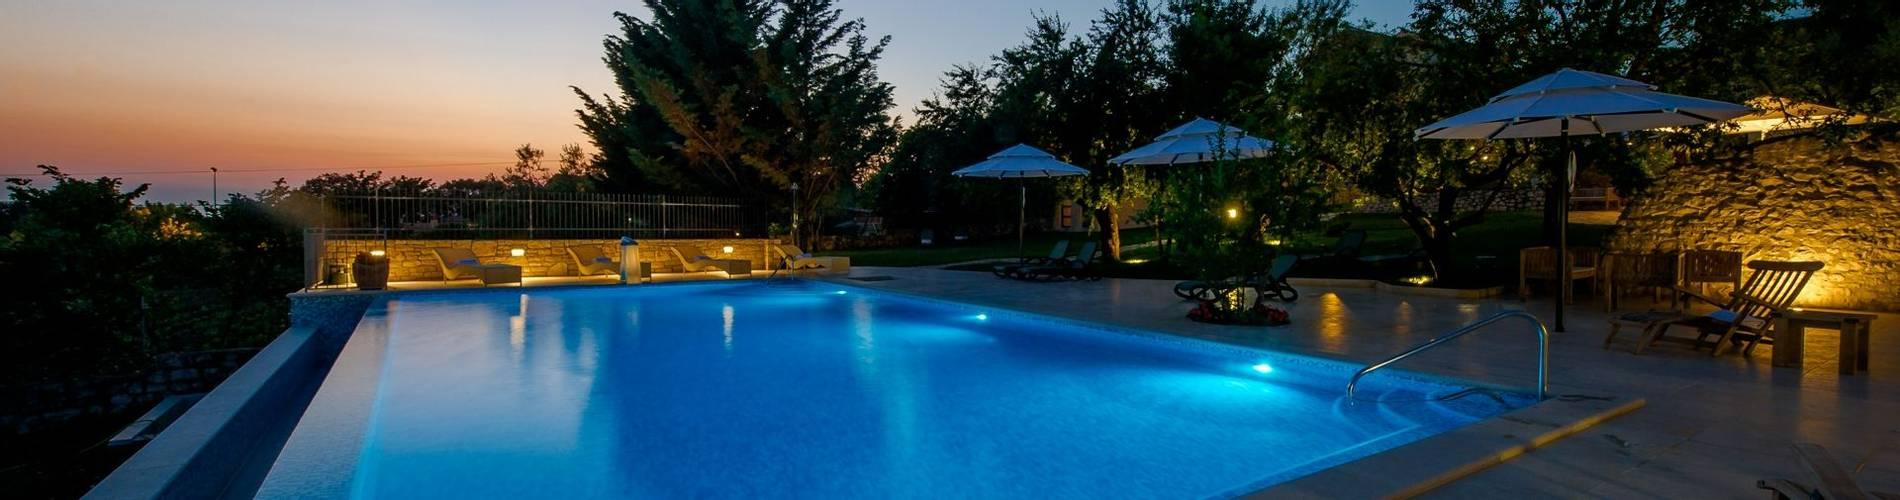 Heritage Hotel San Rocco, Istra, Croatia (9).jpg